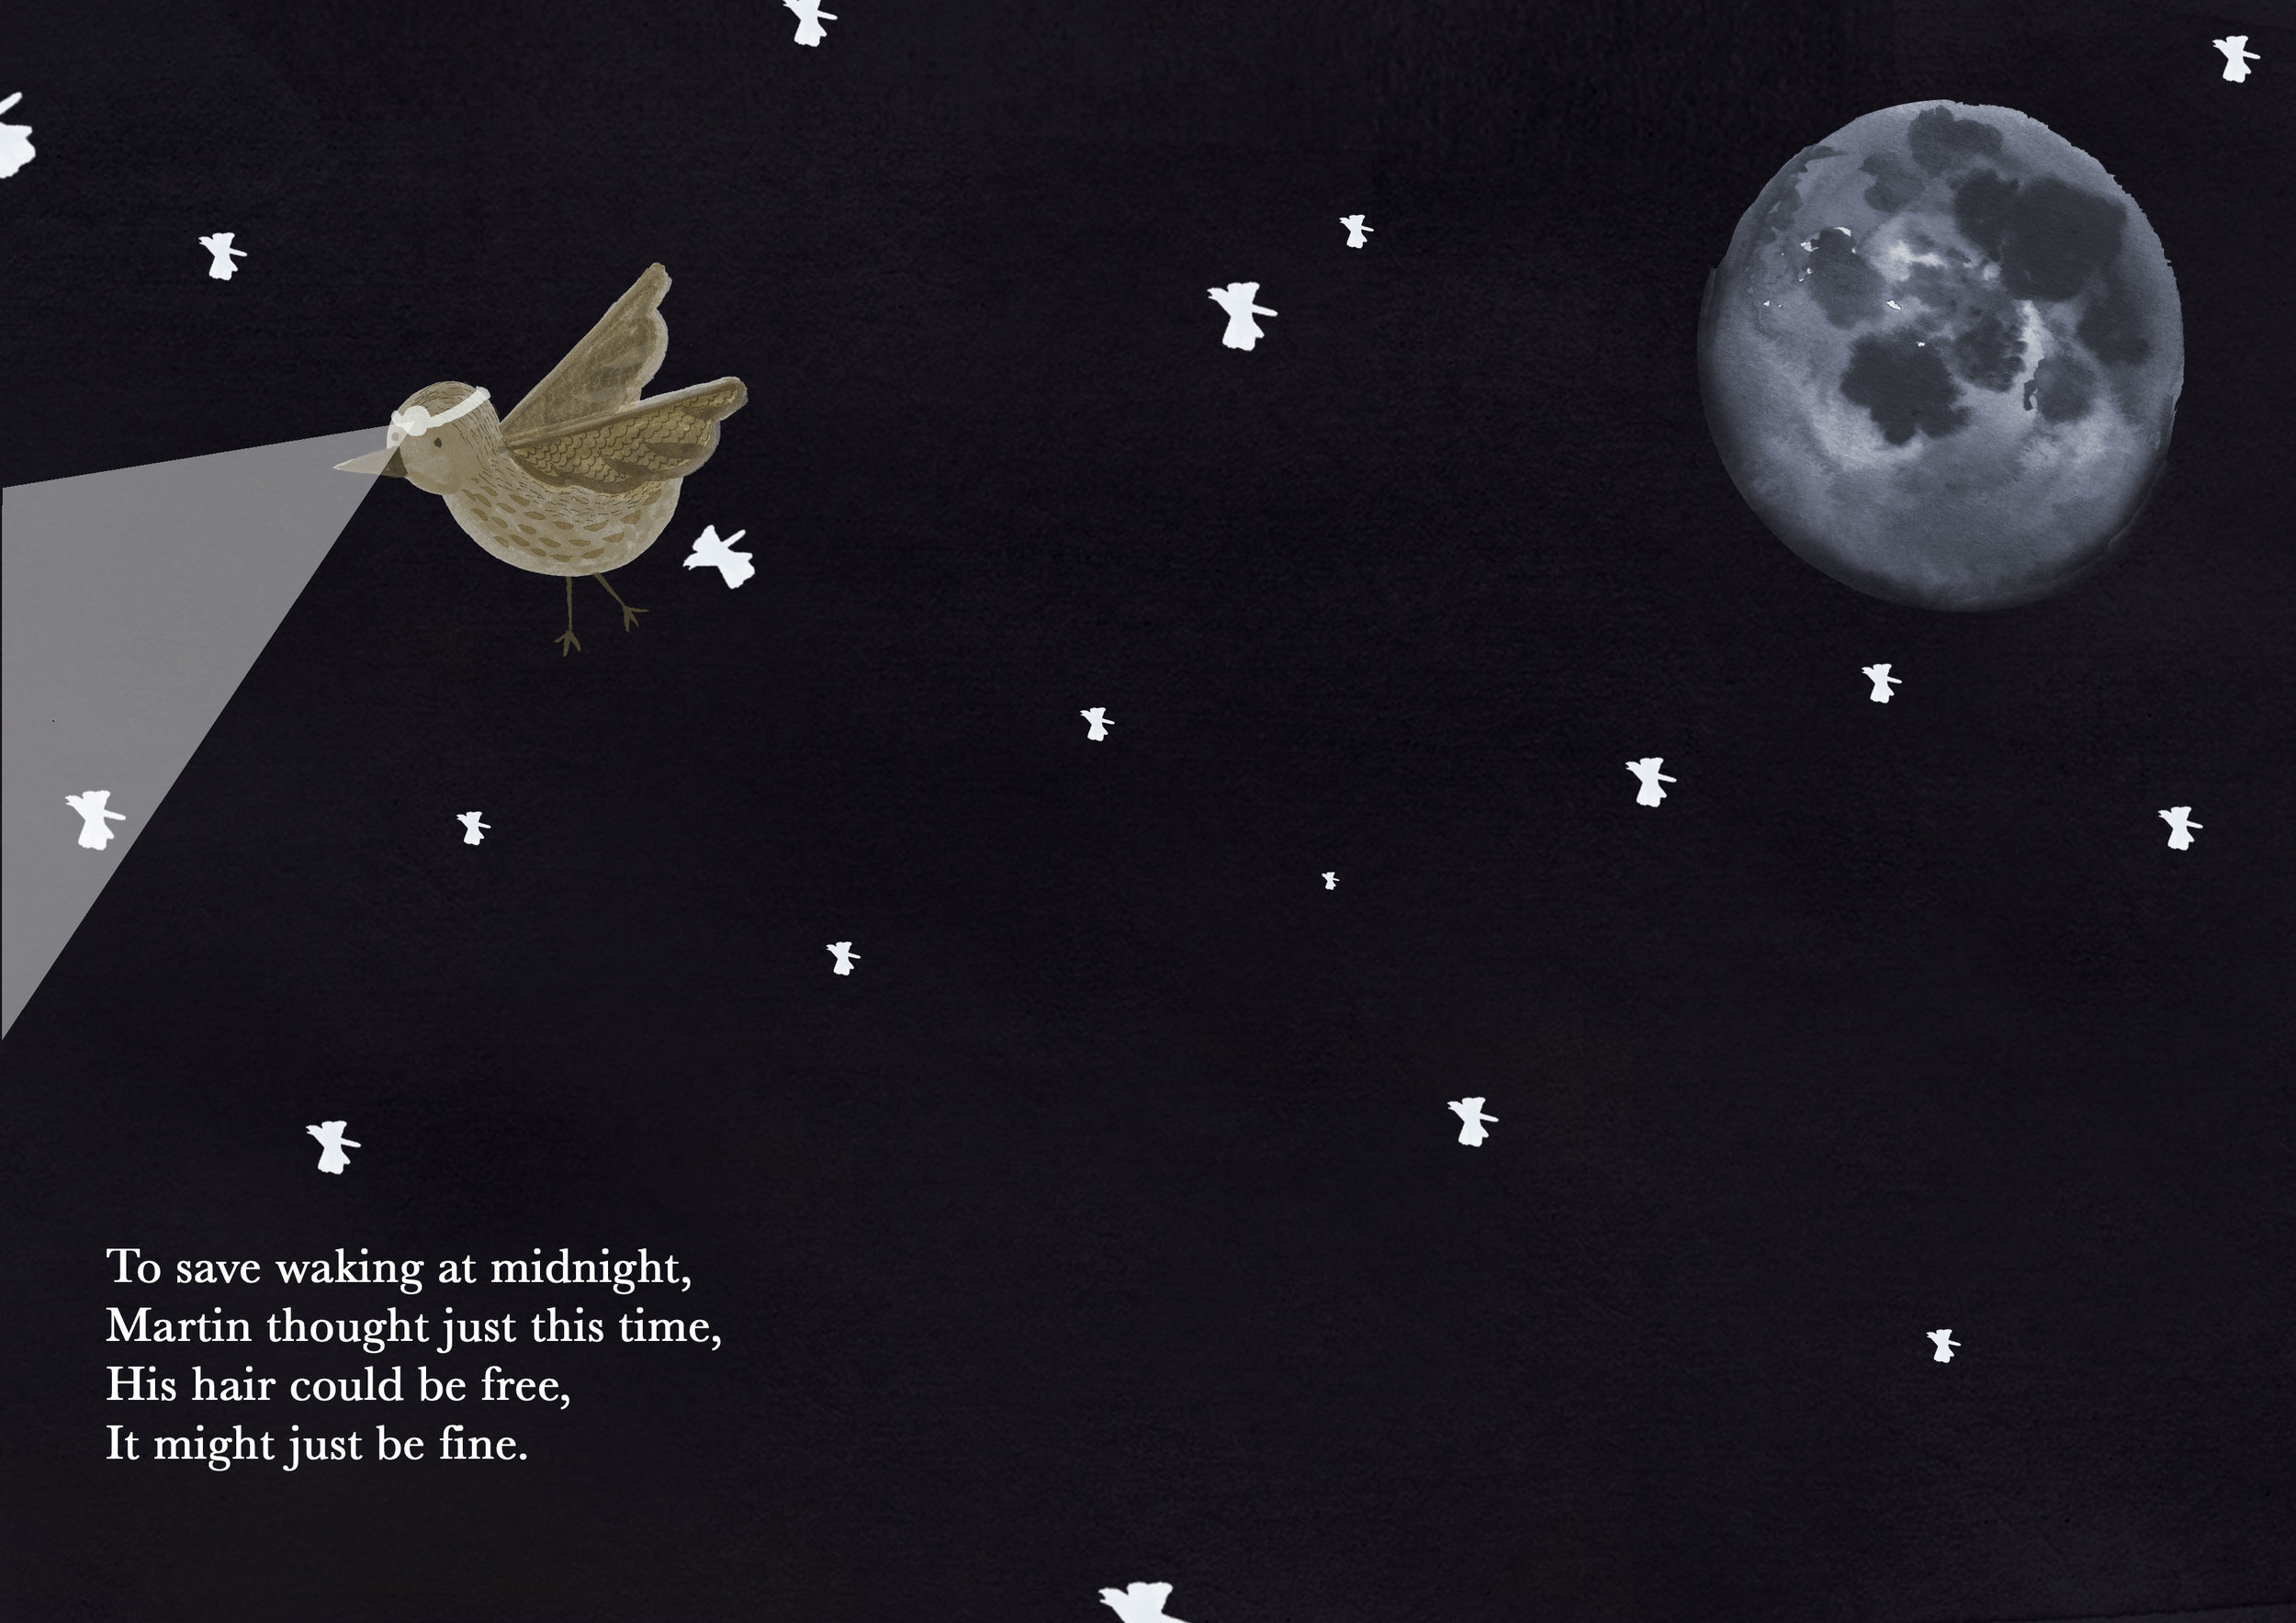 14_MARTIN SIDE-PARTIN_Starry Night Sky_B.jpg